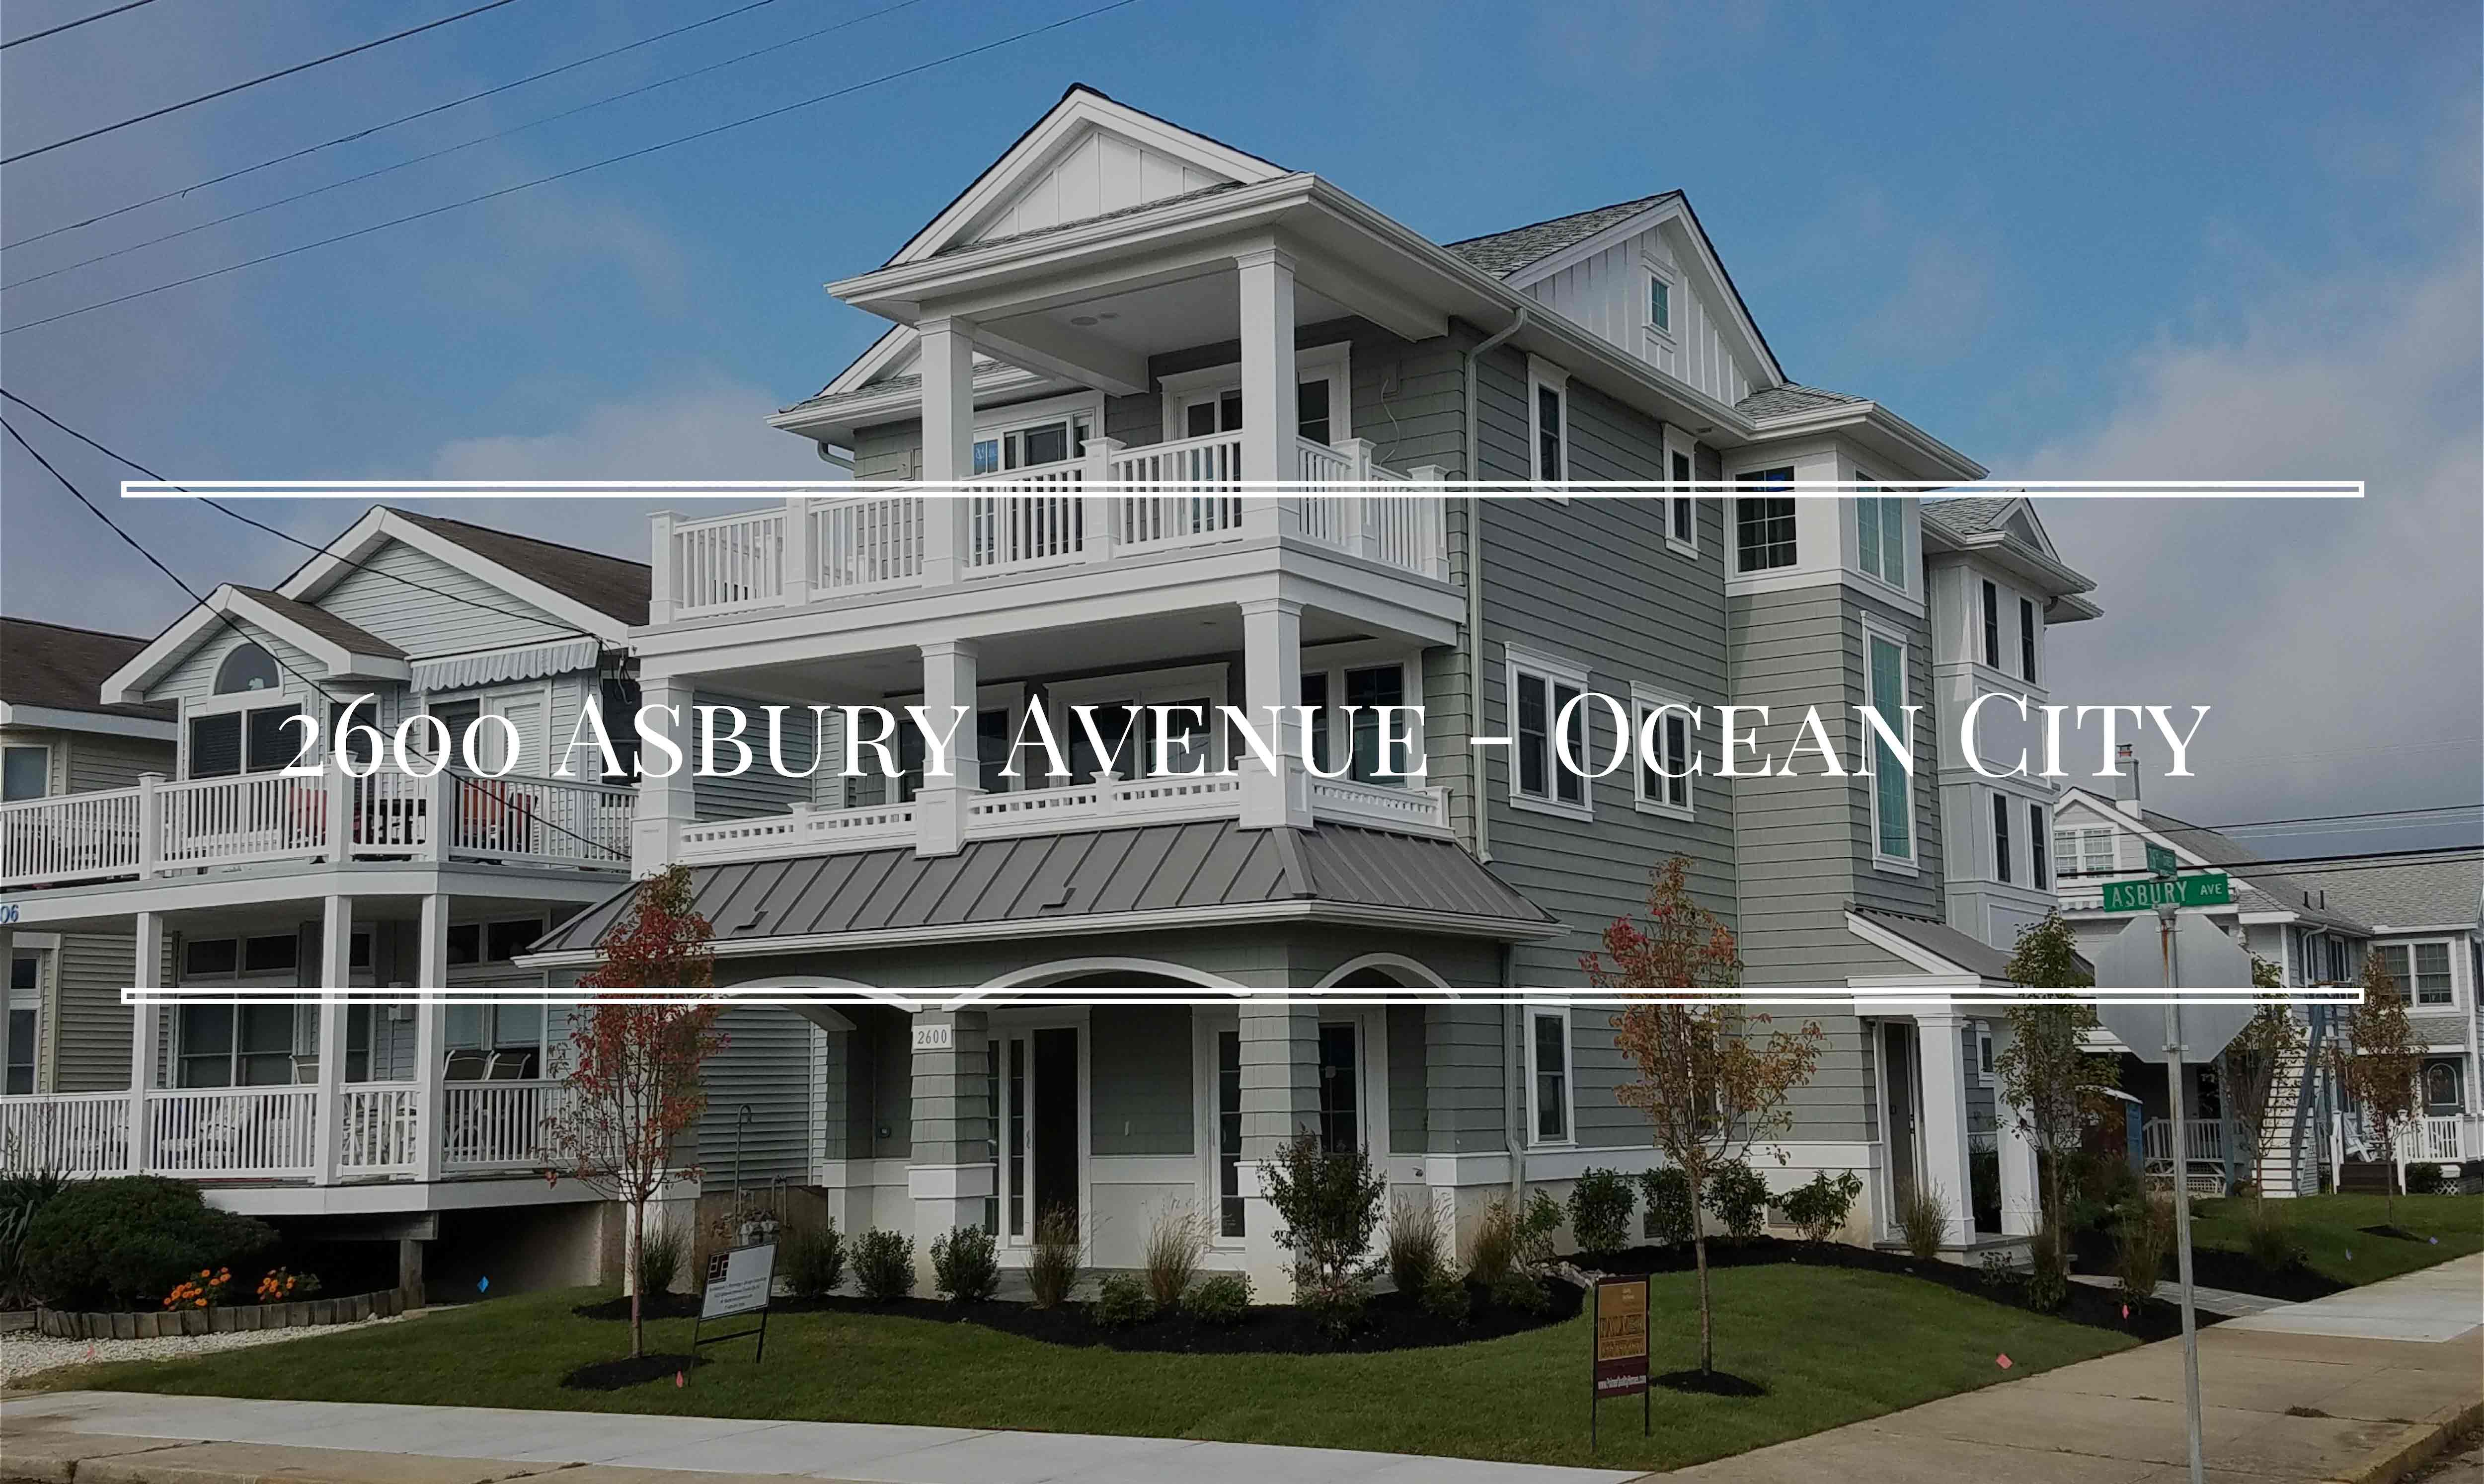 2600-Asbury-Avenue---Ocean-City